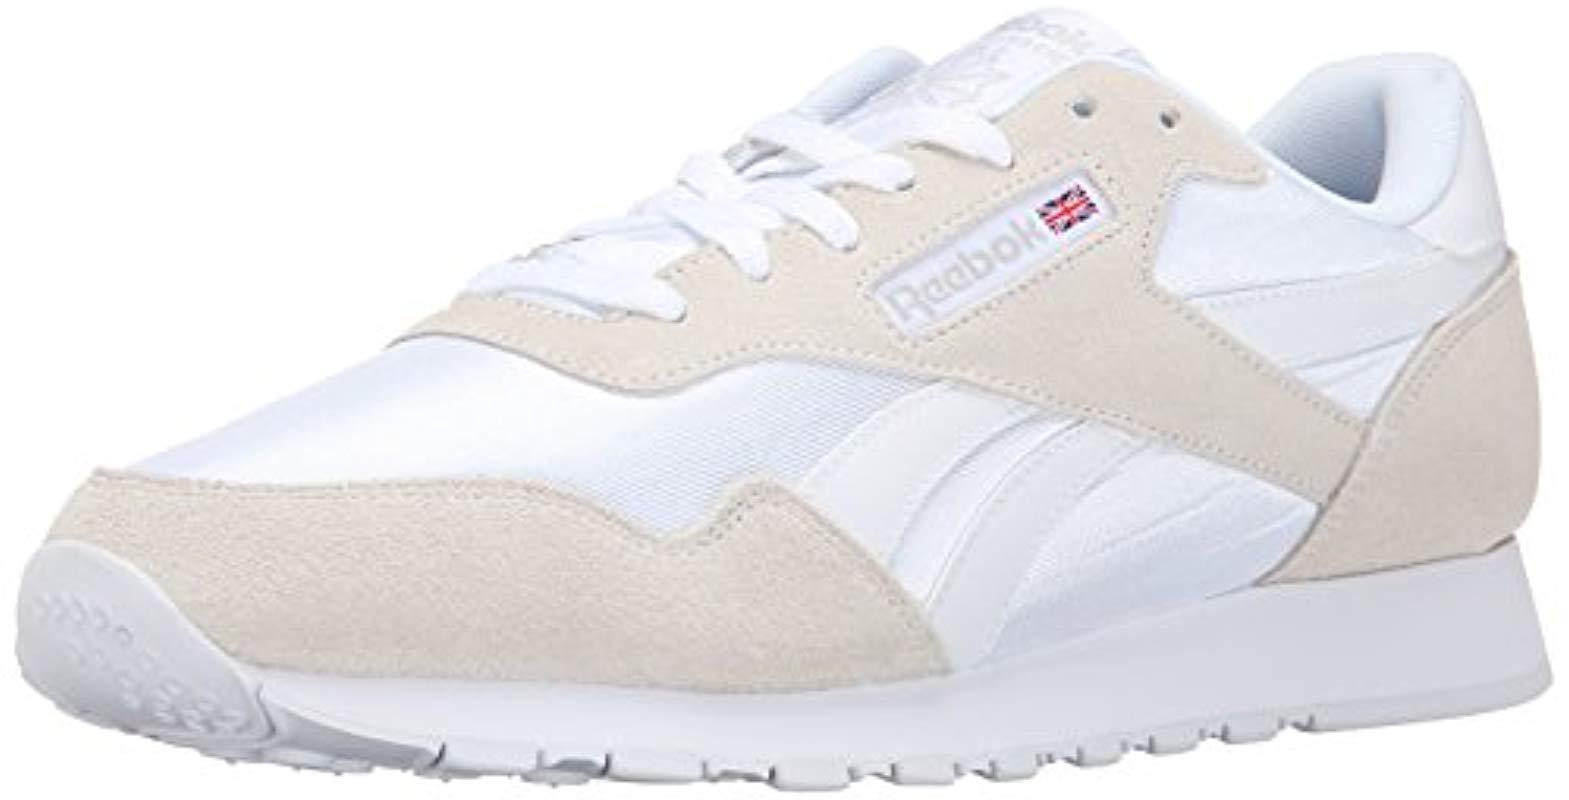 4f22289a87f40 Lyst - Reebok Royal Nylon Classic Sneaker Fashion in White for Men